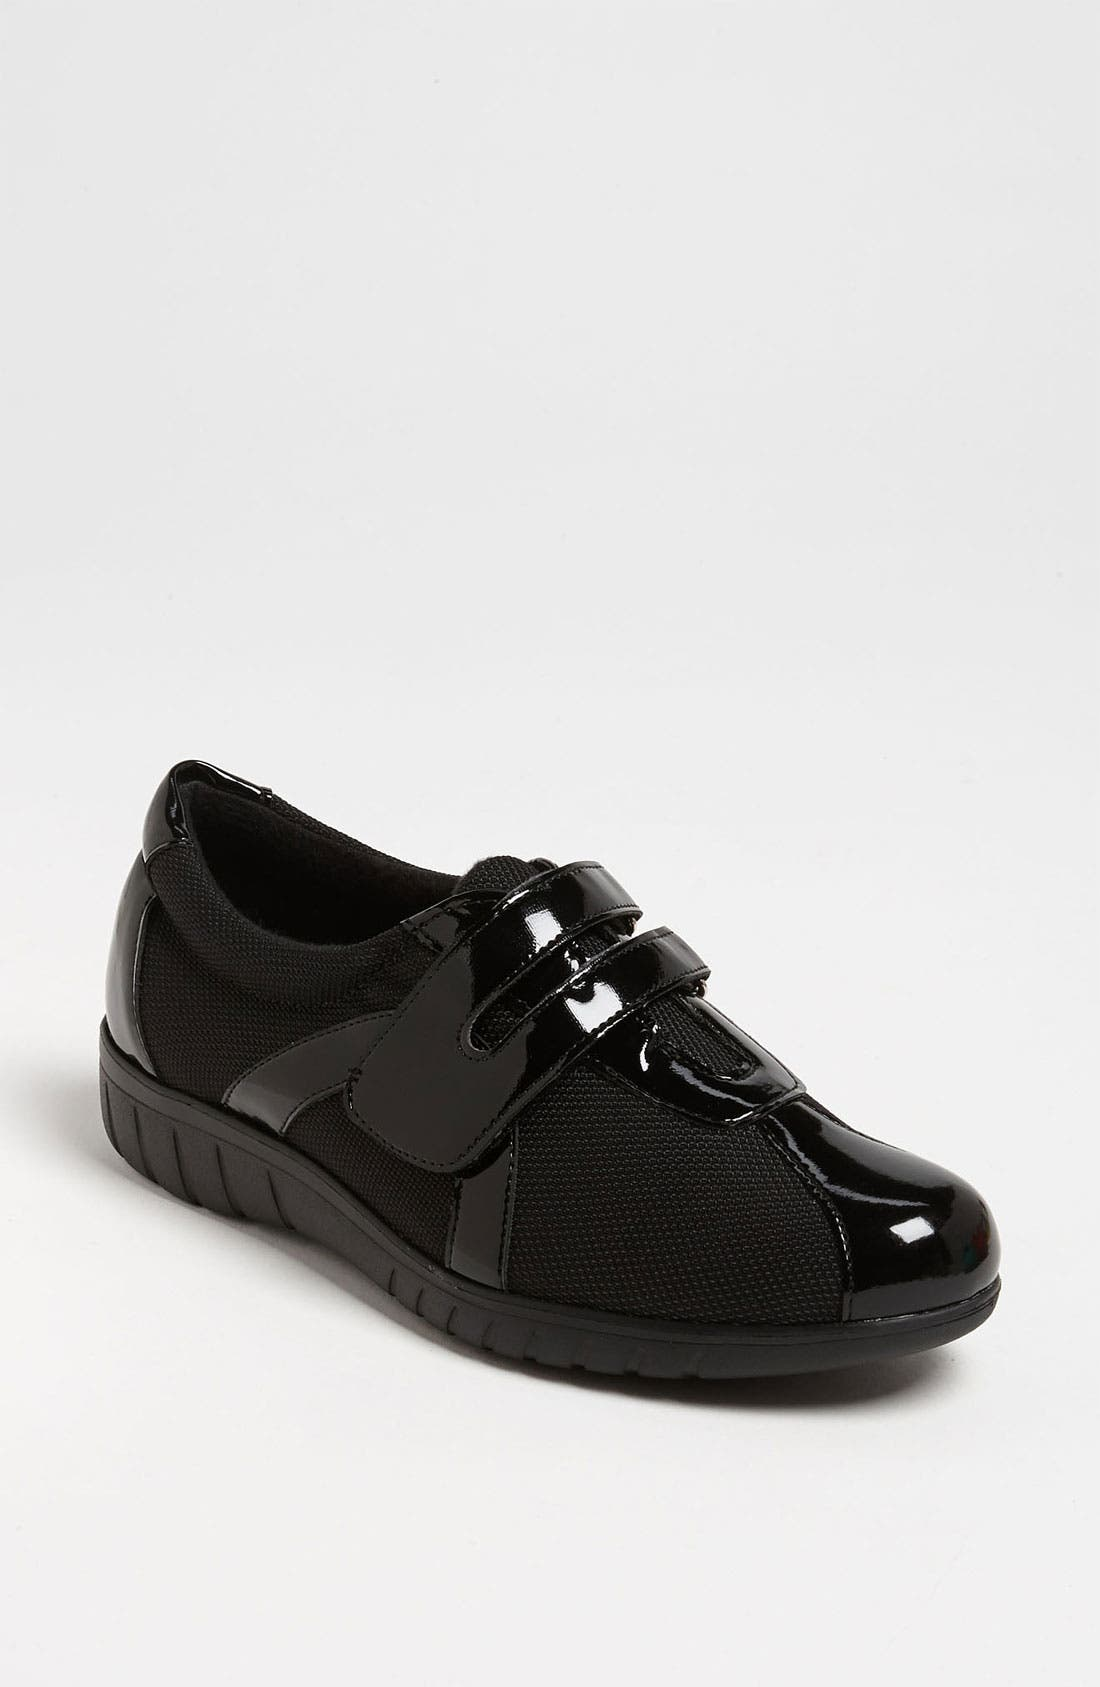 Main Image - Munro 'Jewel' Sneaker